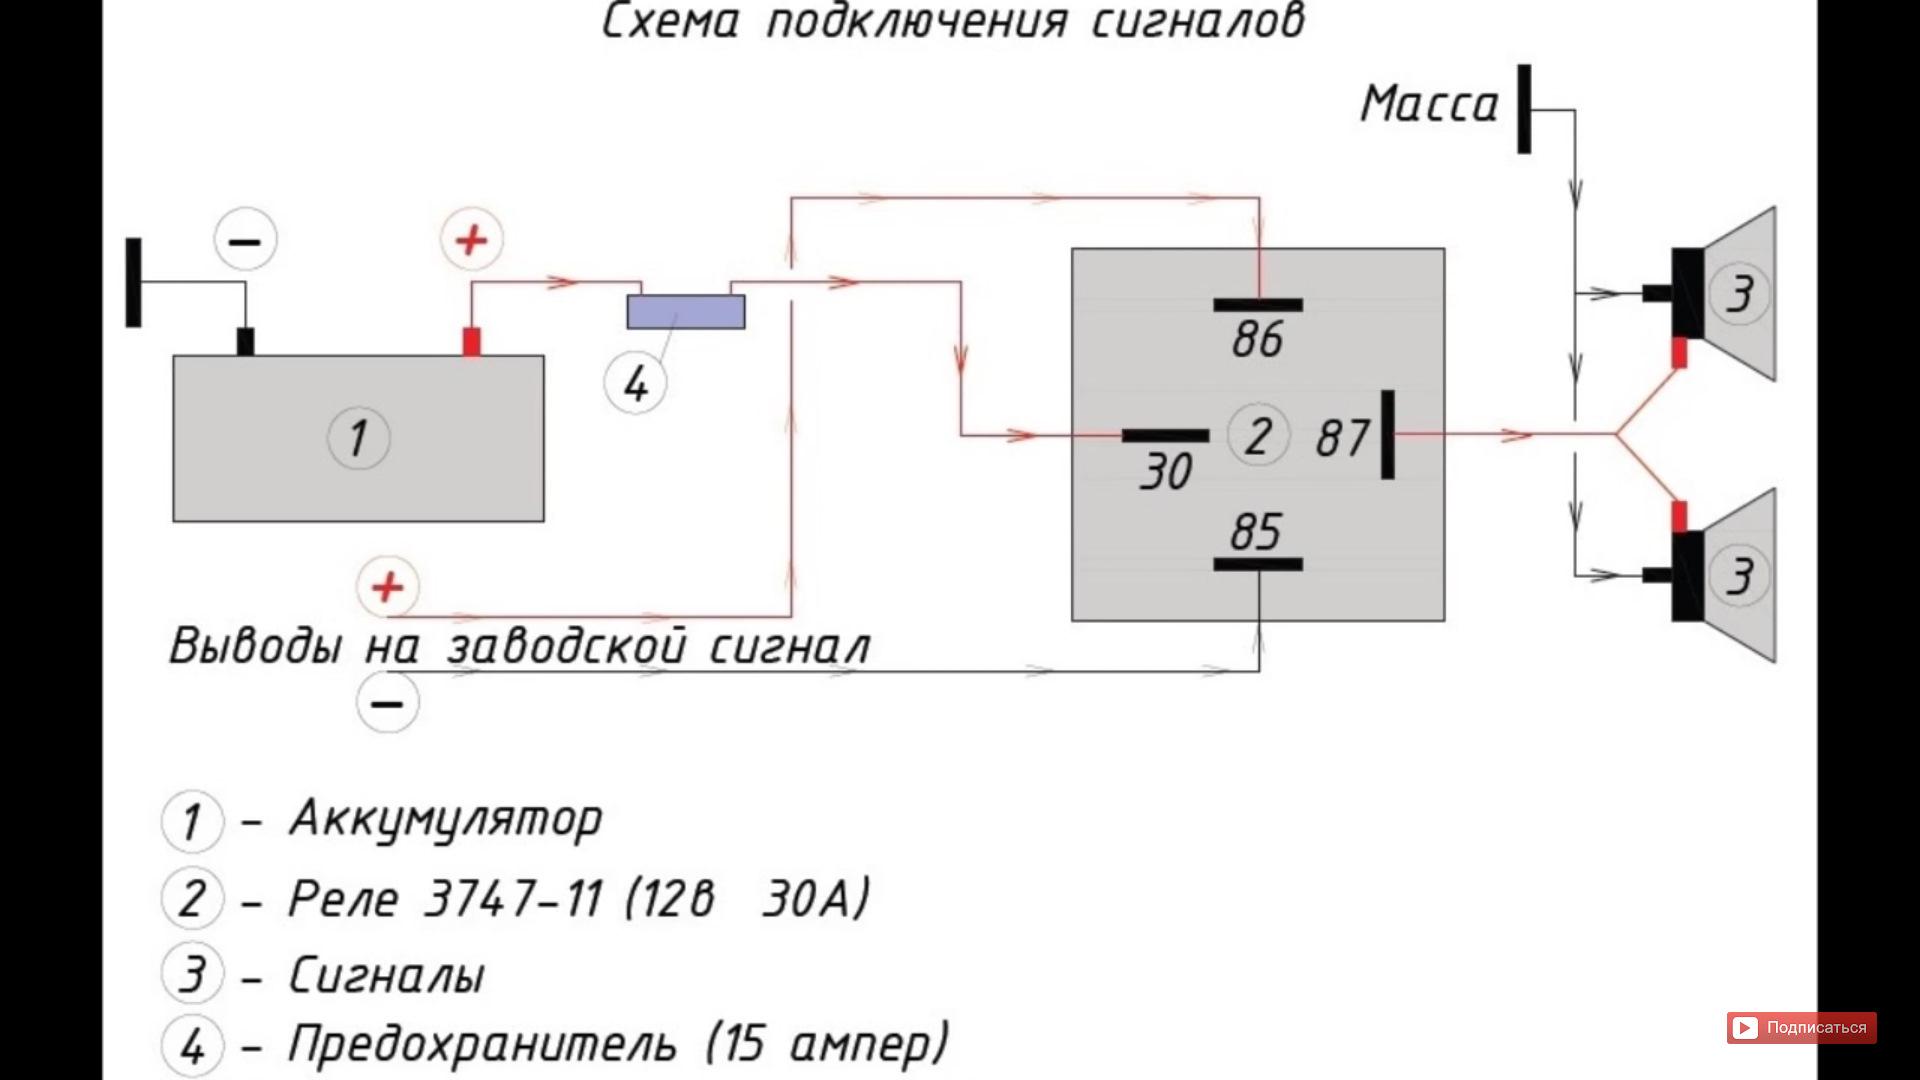 Подключение противотуманок через реле: схема Как подключить через реле схема